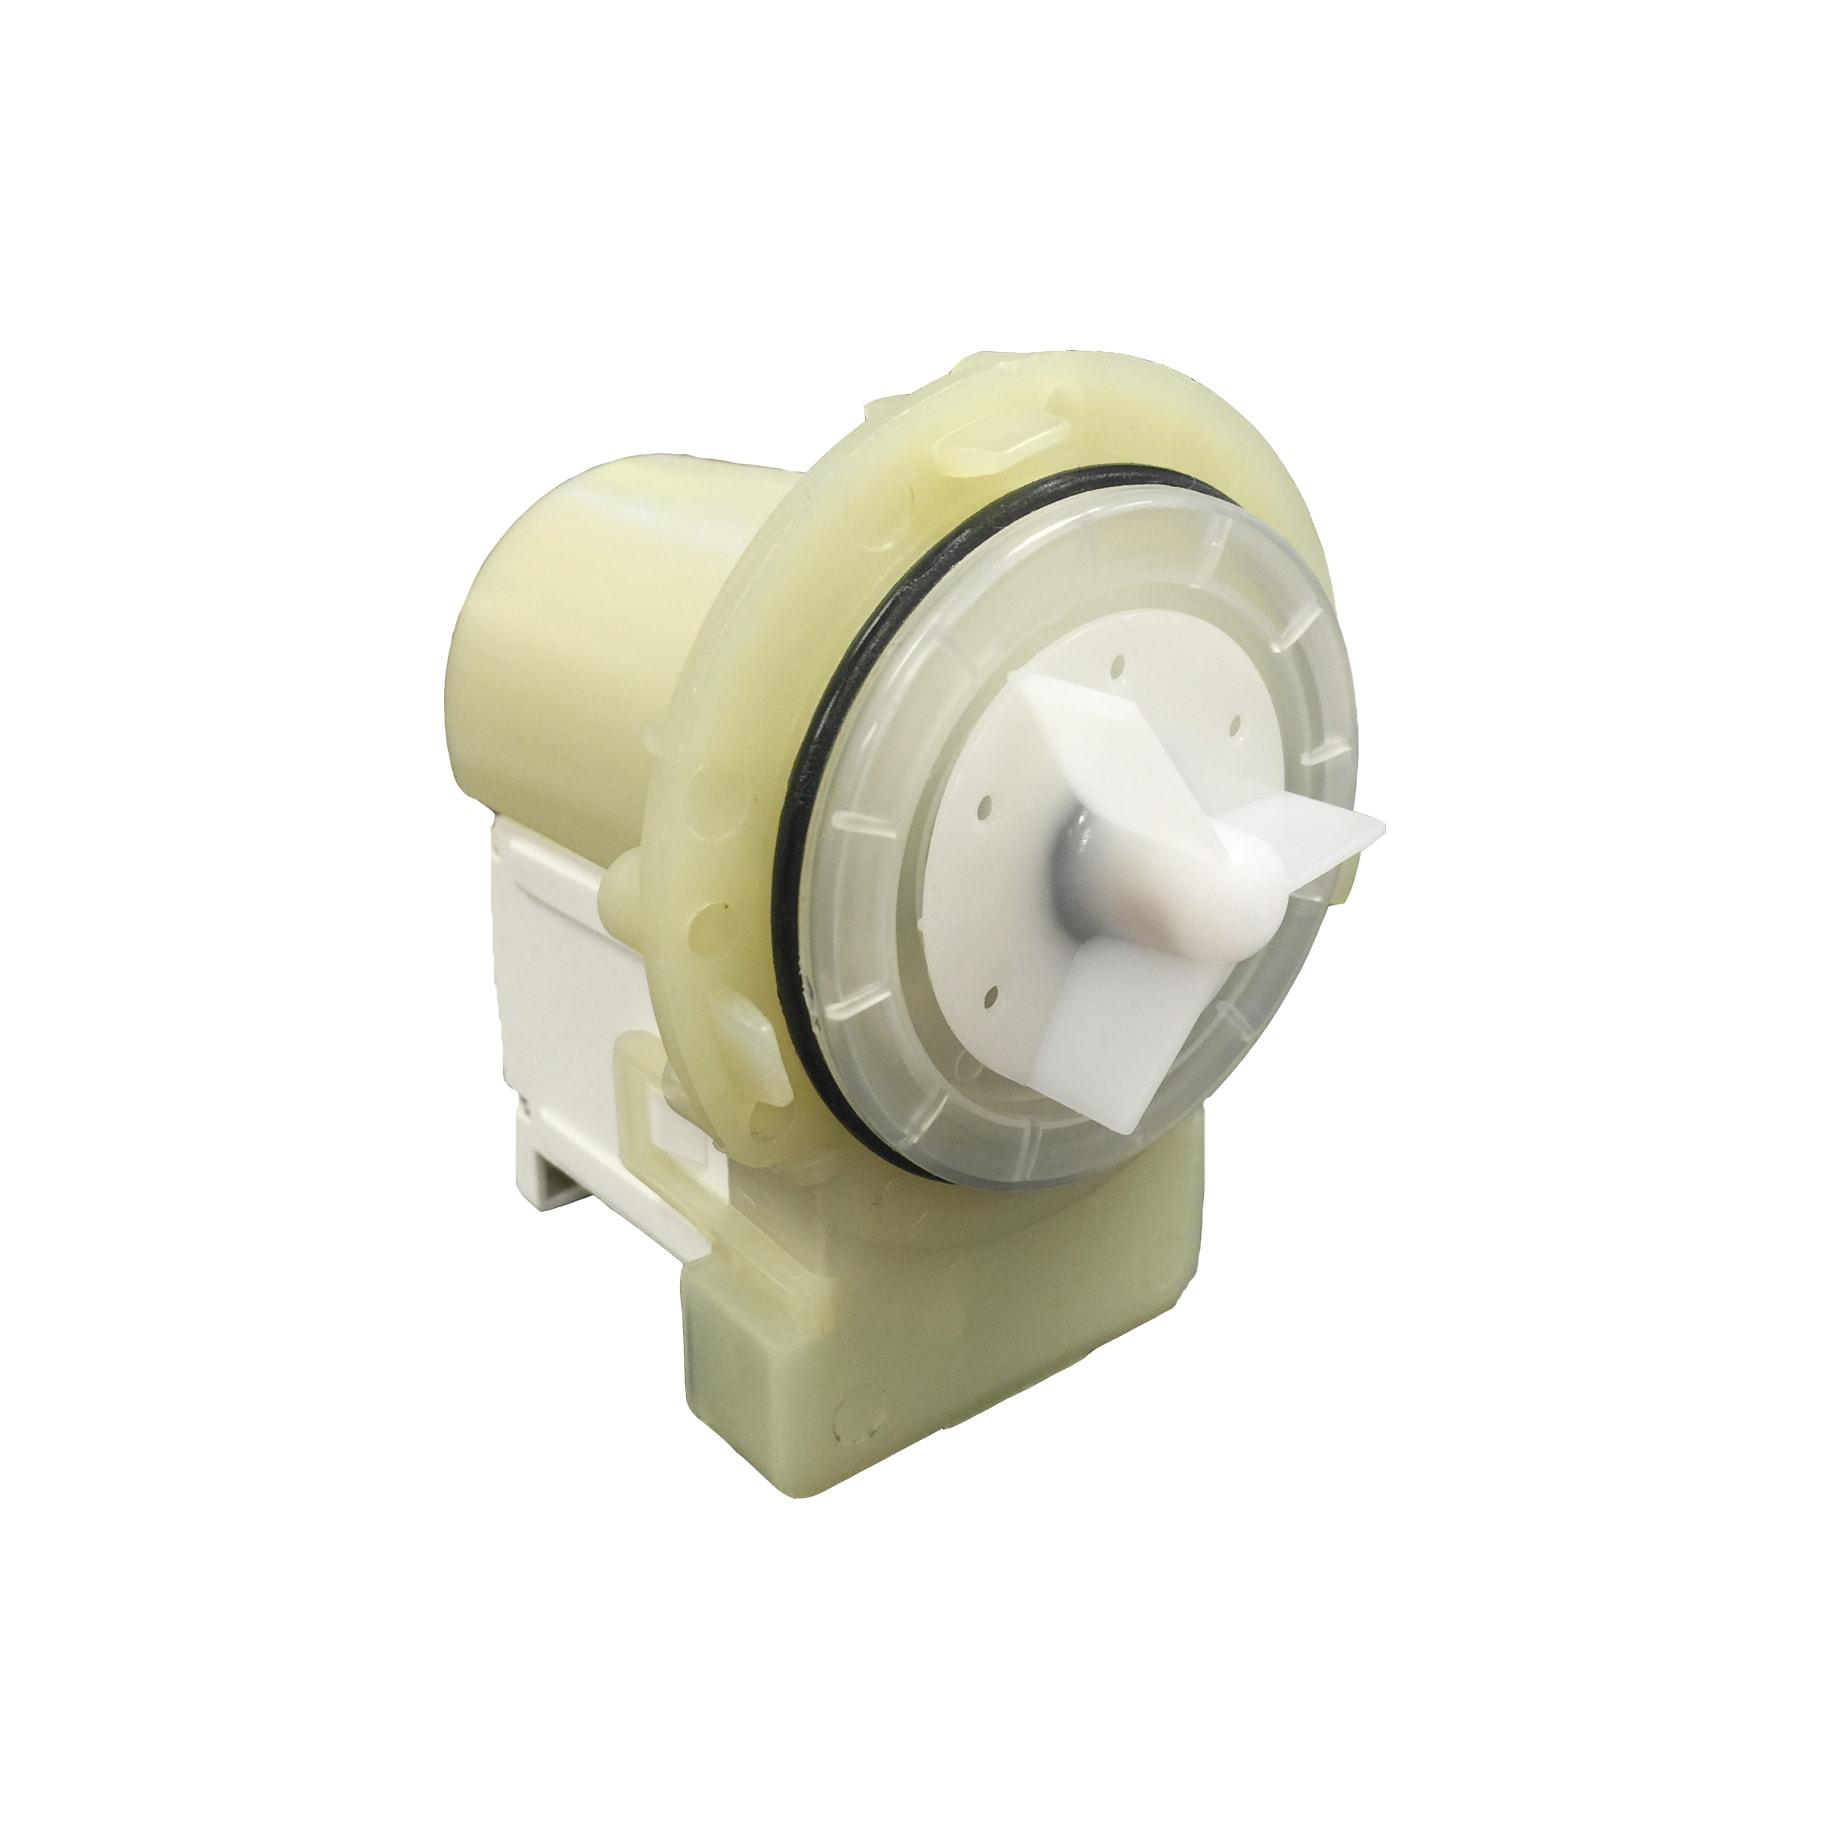 Crucial LG Washing Machine Drain Pump and Motor Assembly ...